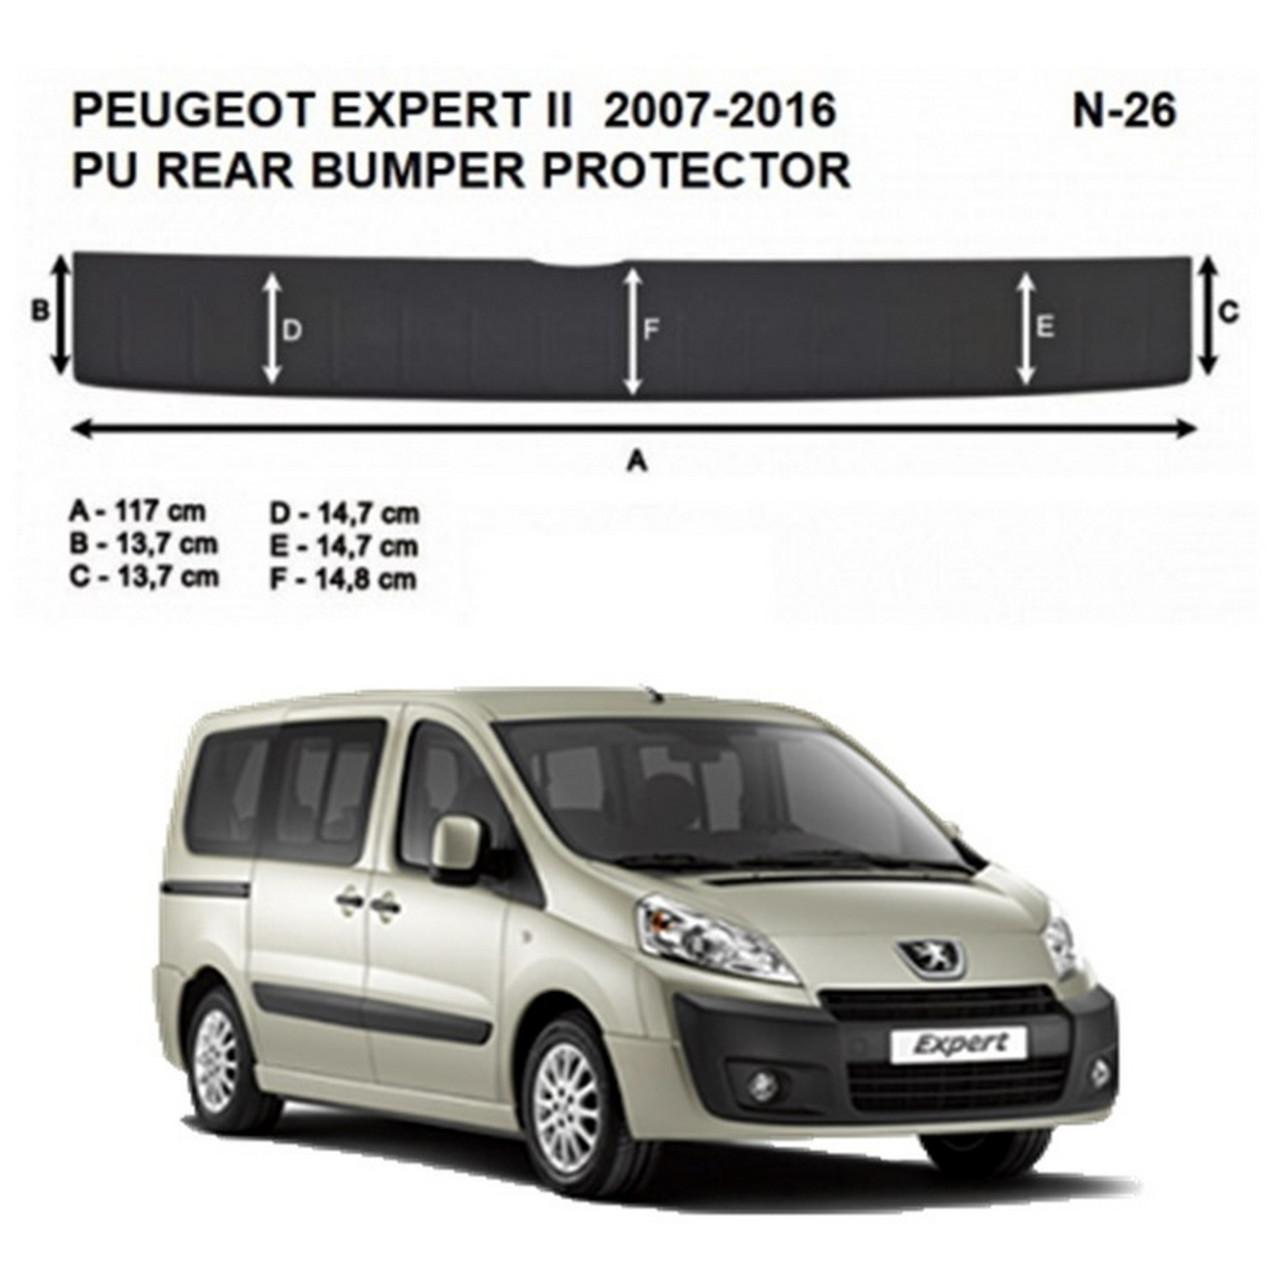 Пластиковая защитная накладка на задний бампер для Peugeot Expert II 2007-2016